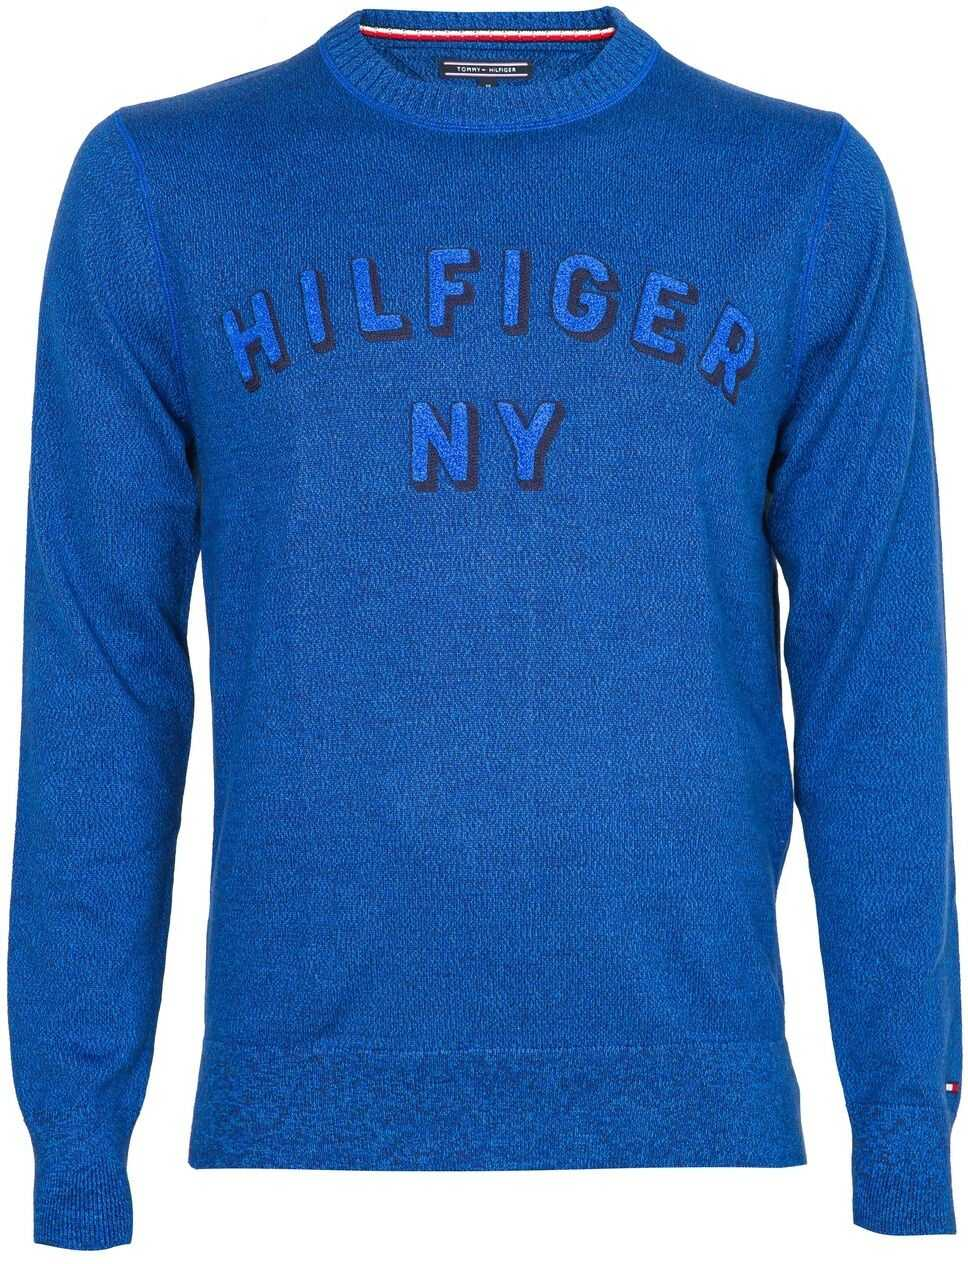 Tommy Hilfiger Structured Mouline MW0MW07139 Blue imagine